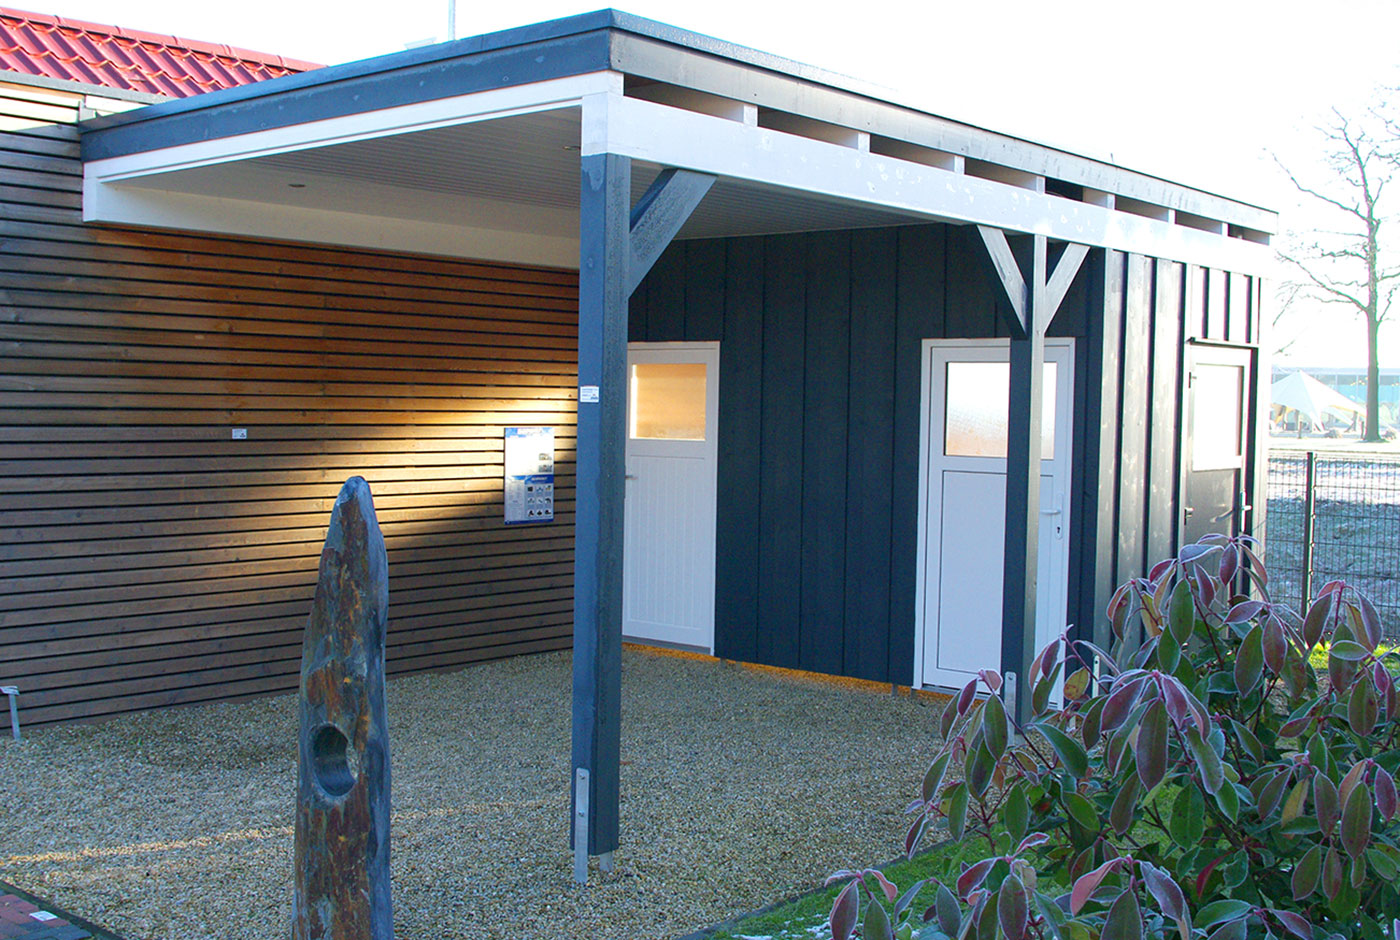 Carport Am Haus : carport am haus anbauen so muss das ~ Markanthonyermac.com Haus und Dekorationen